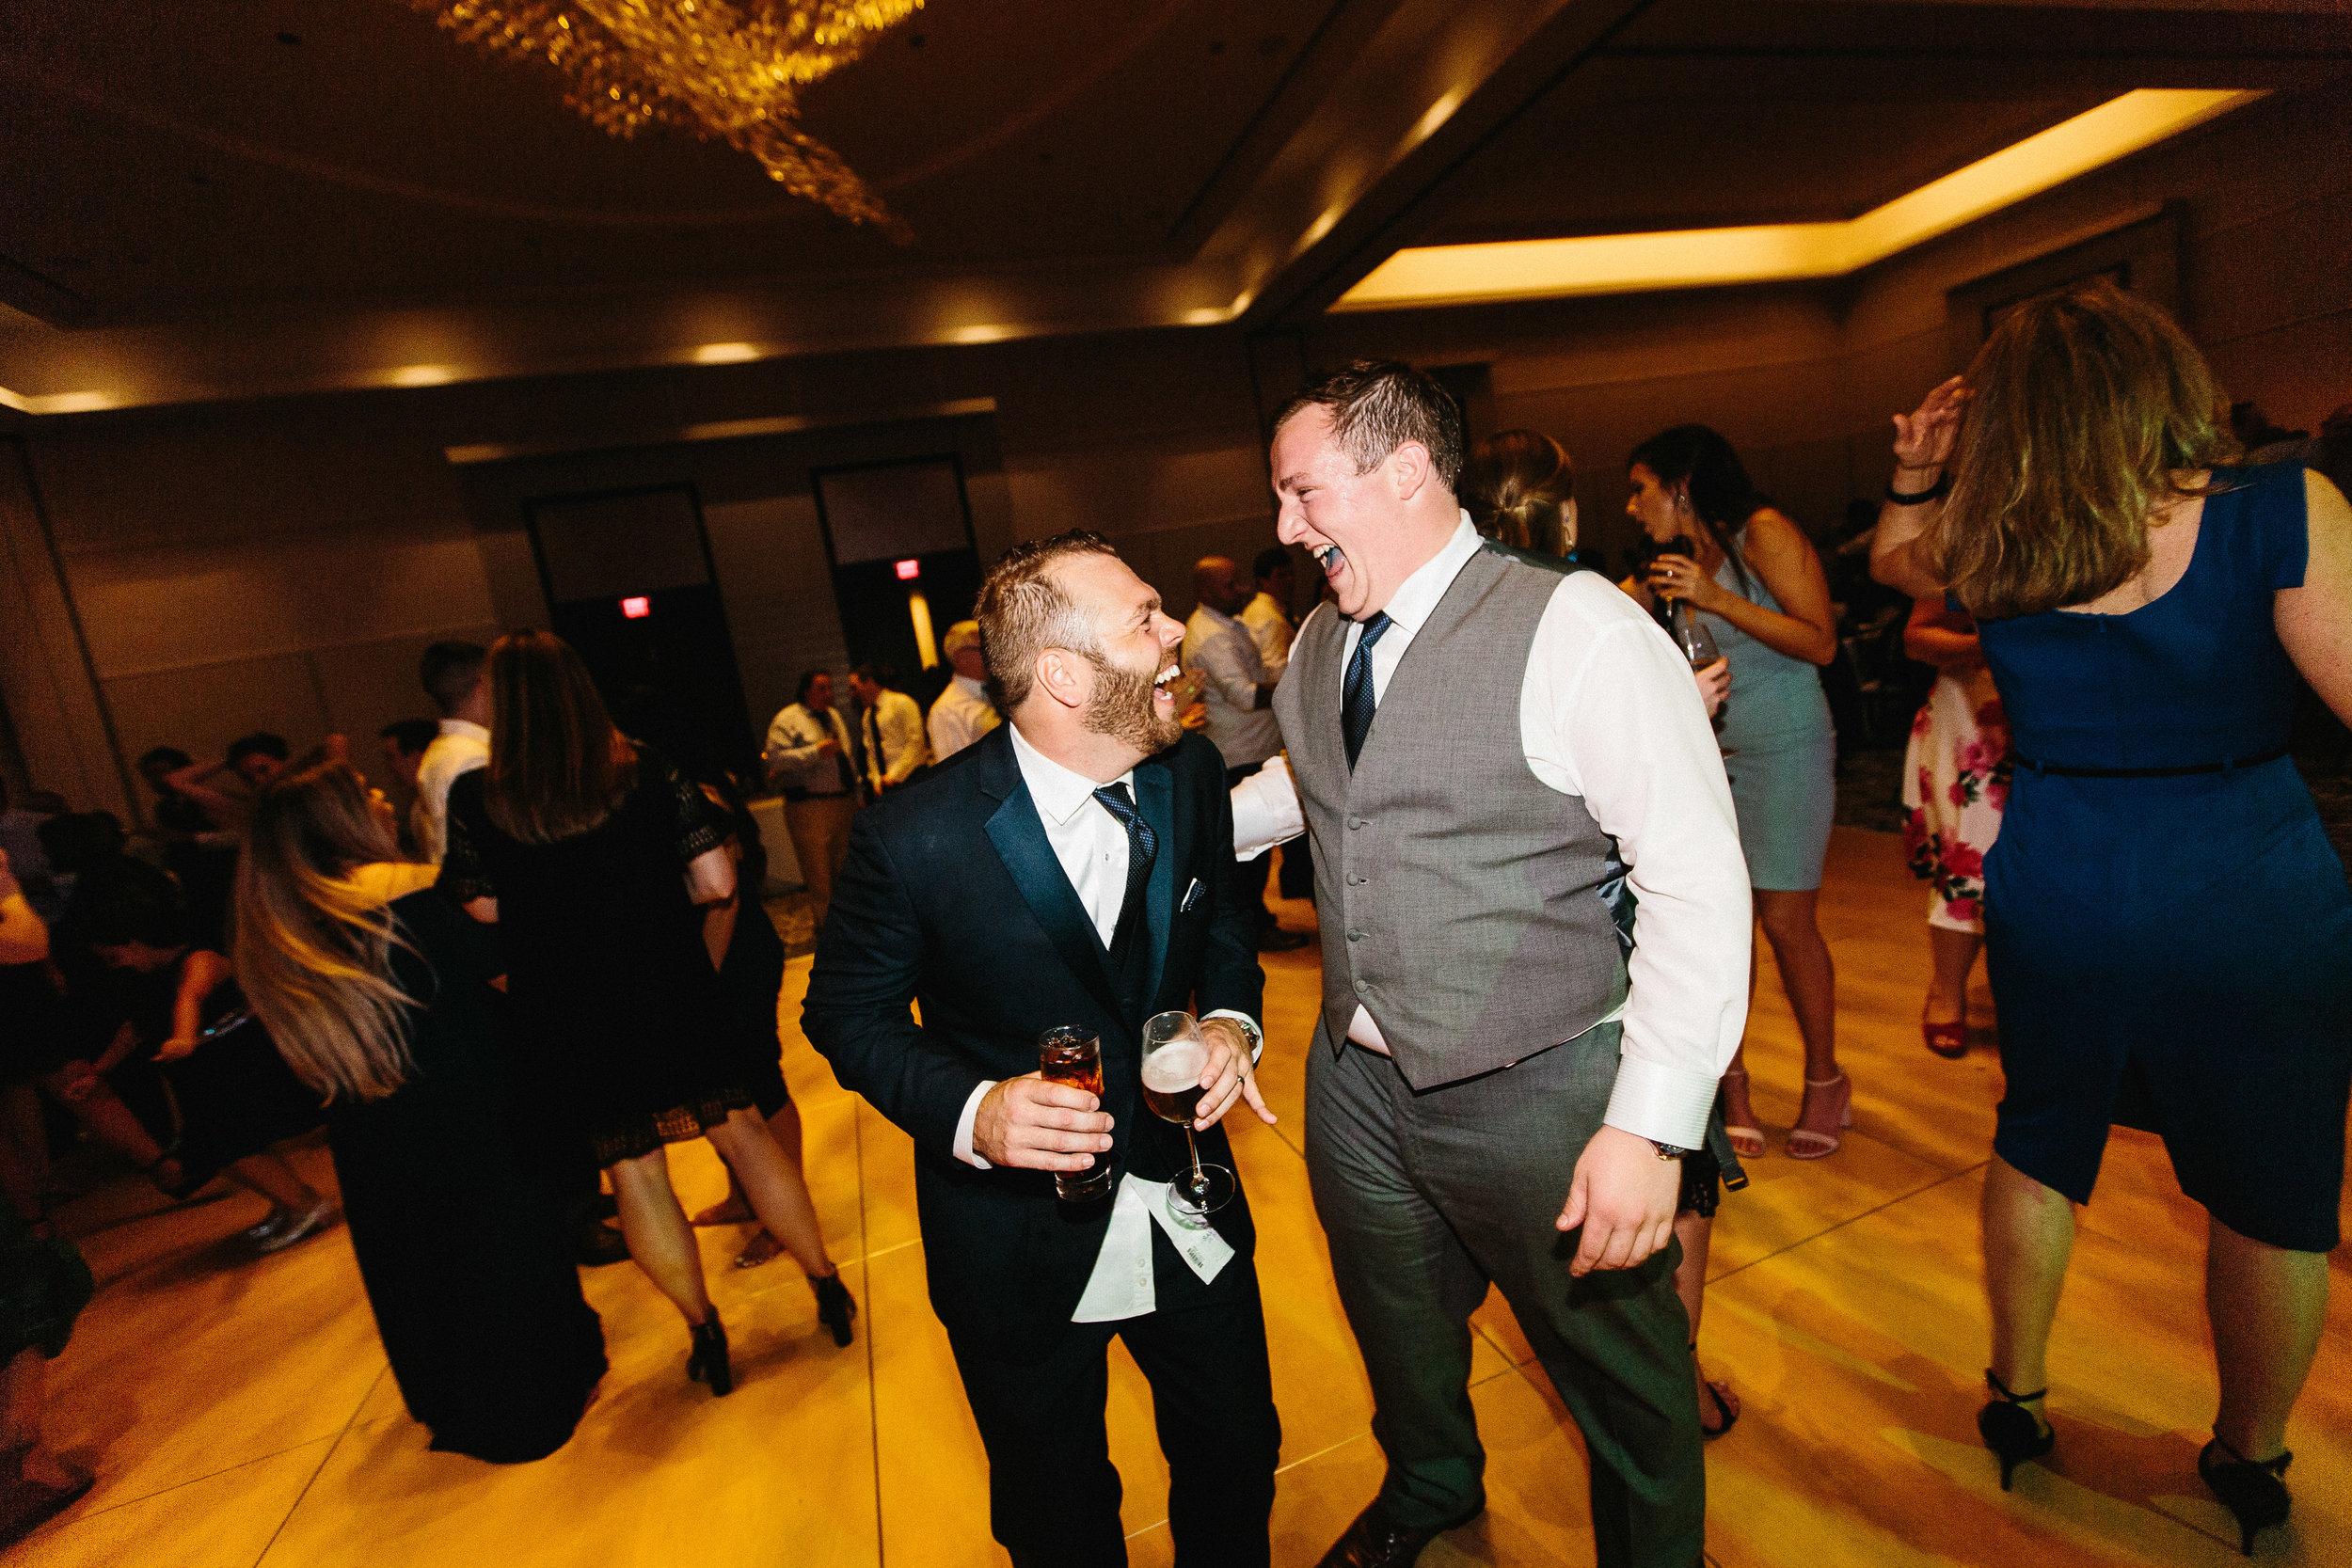 roswell_st_peter_chanel_catholic_avalon_hotel_alpharetta_wedding-2275.jpg